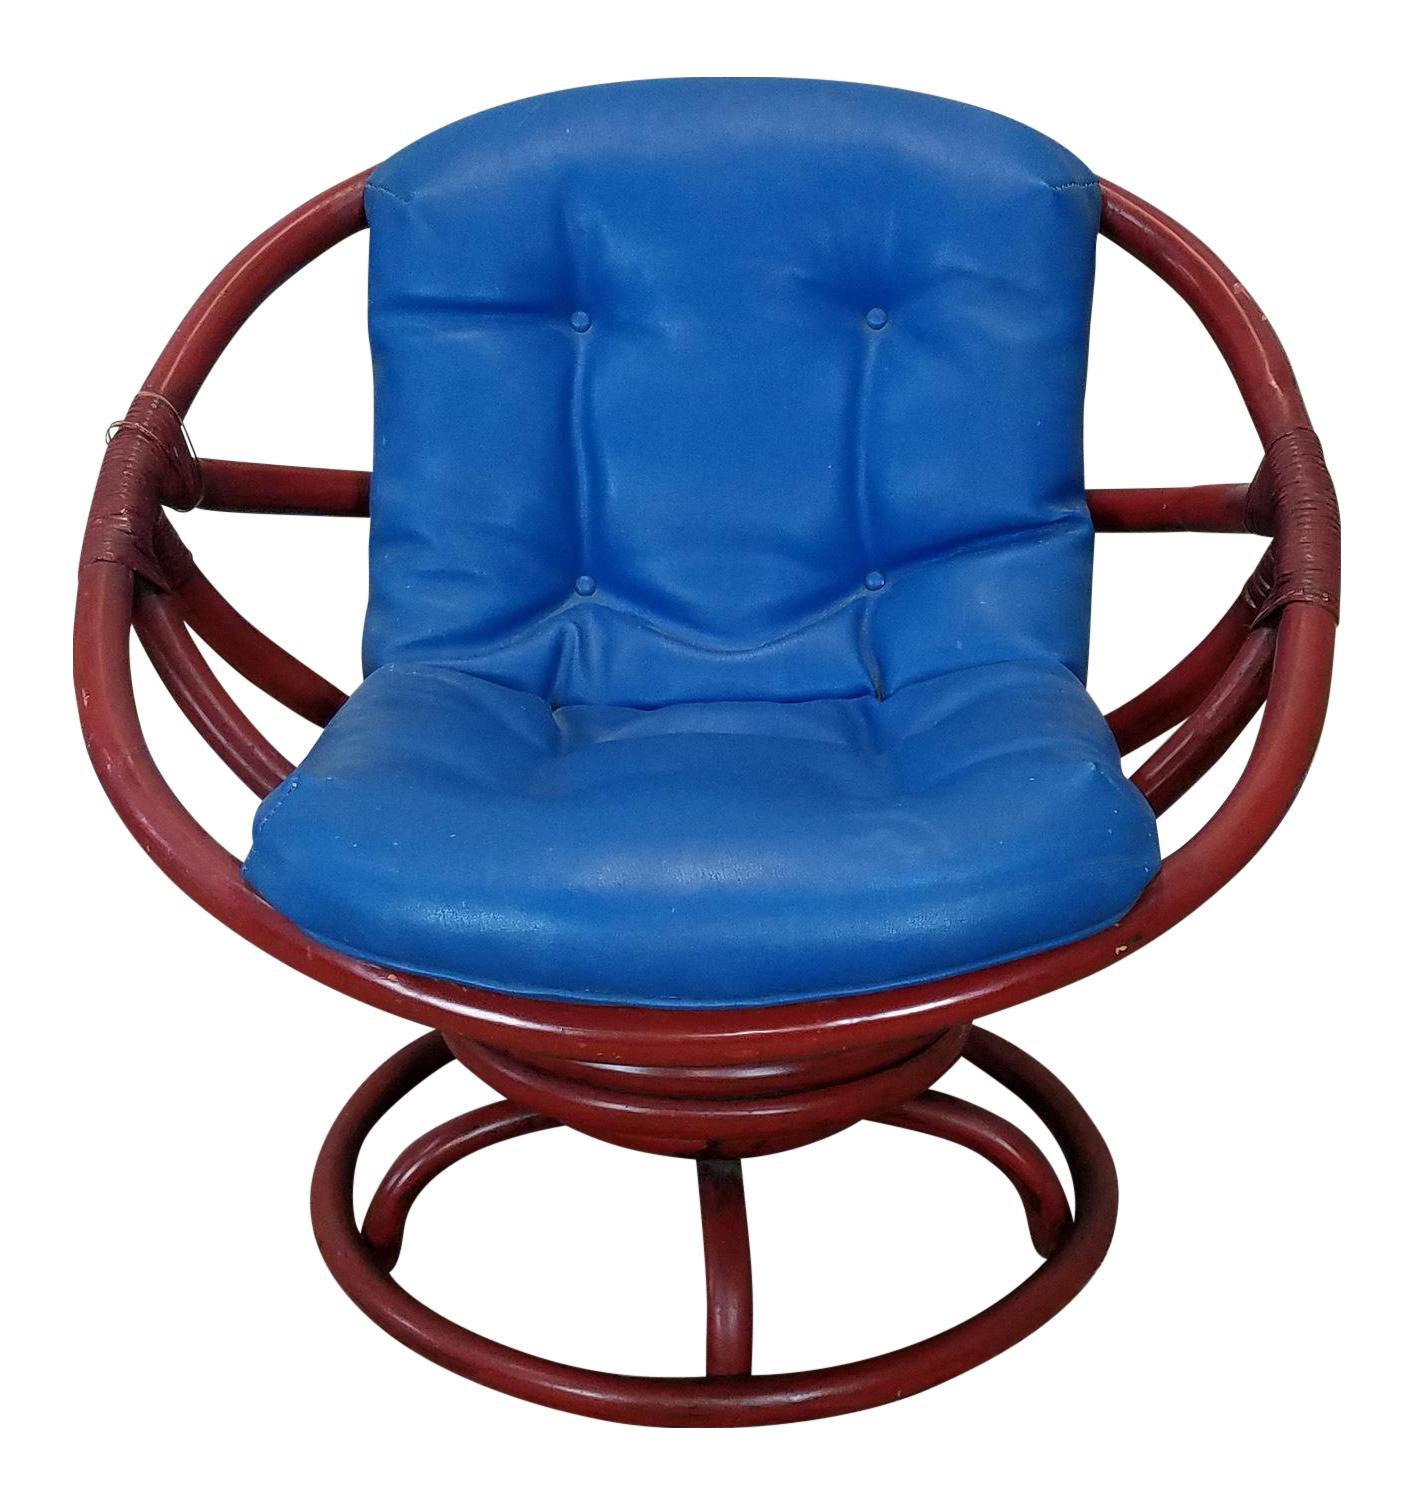 Vintage Ficks Reed Red Rattan Swivel Papasan Chair on Vintage Ficks Reed Rattan Furniture